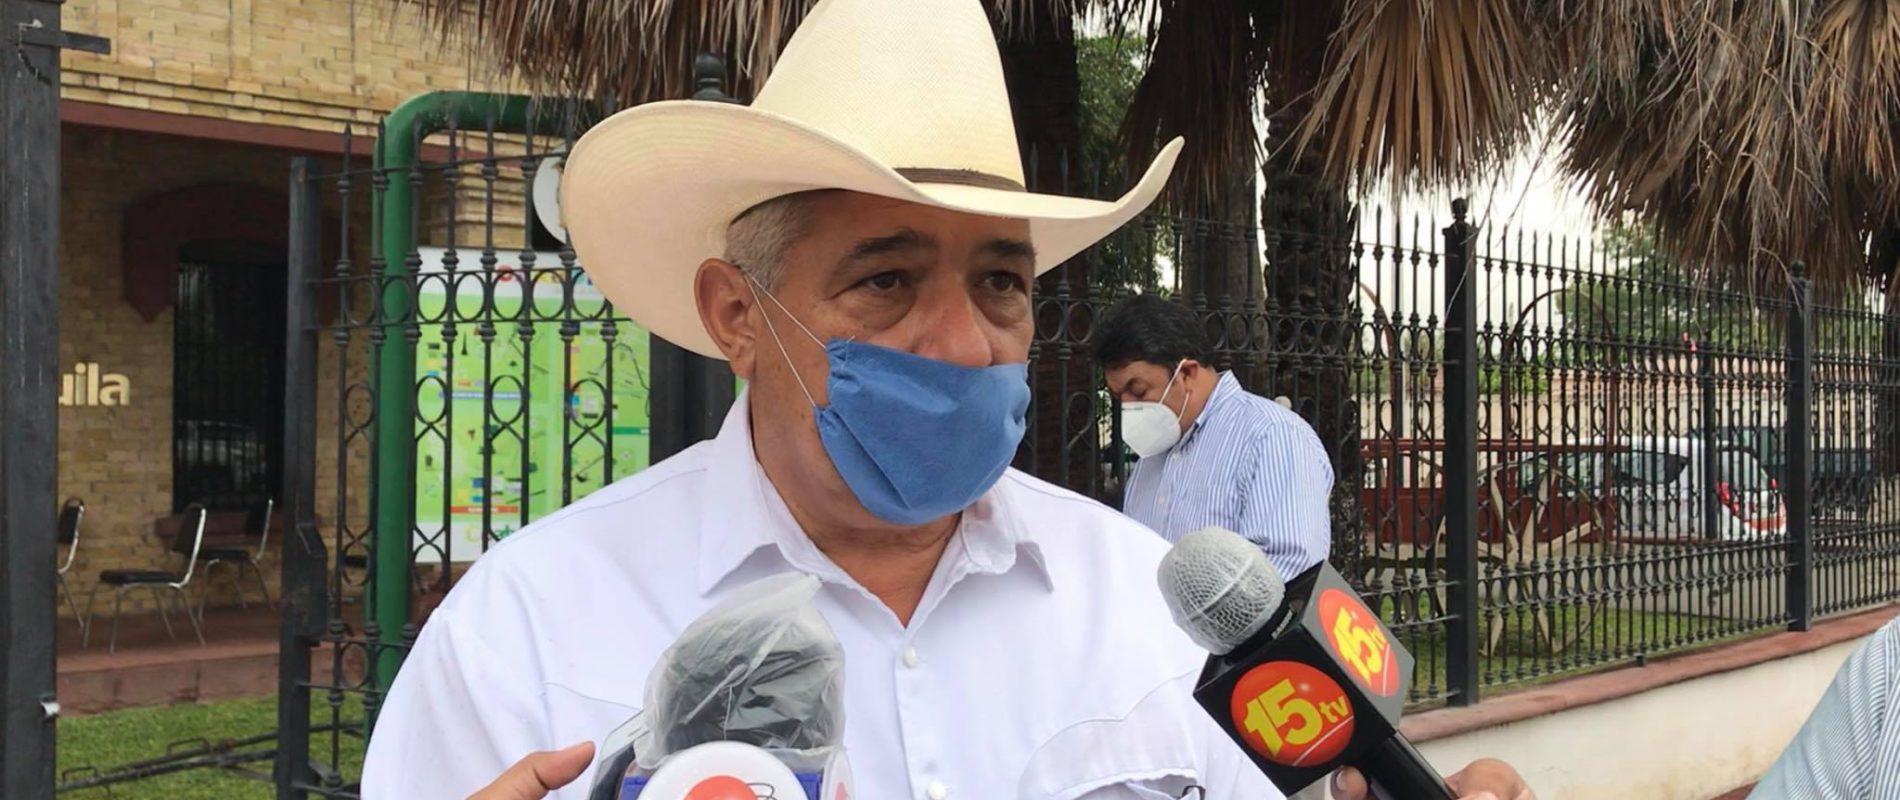 Temo Rodríguez